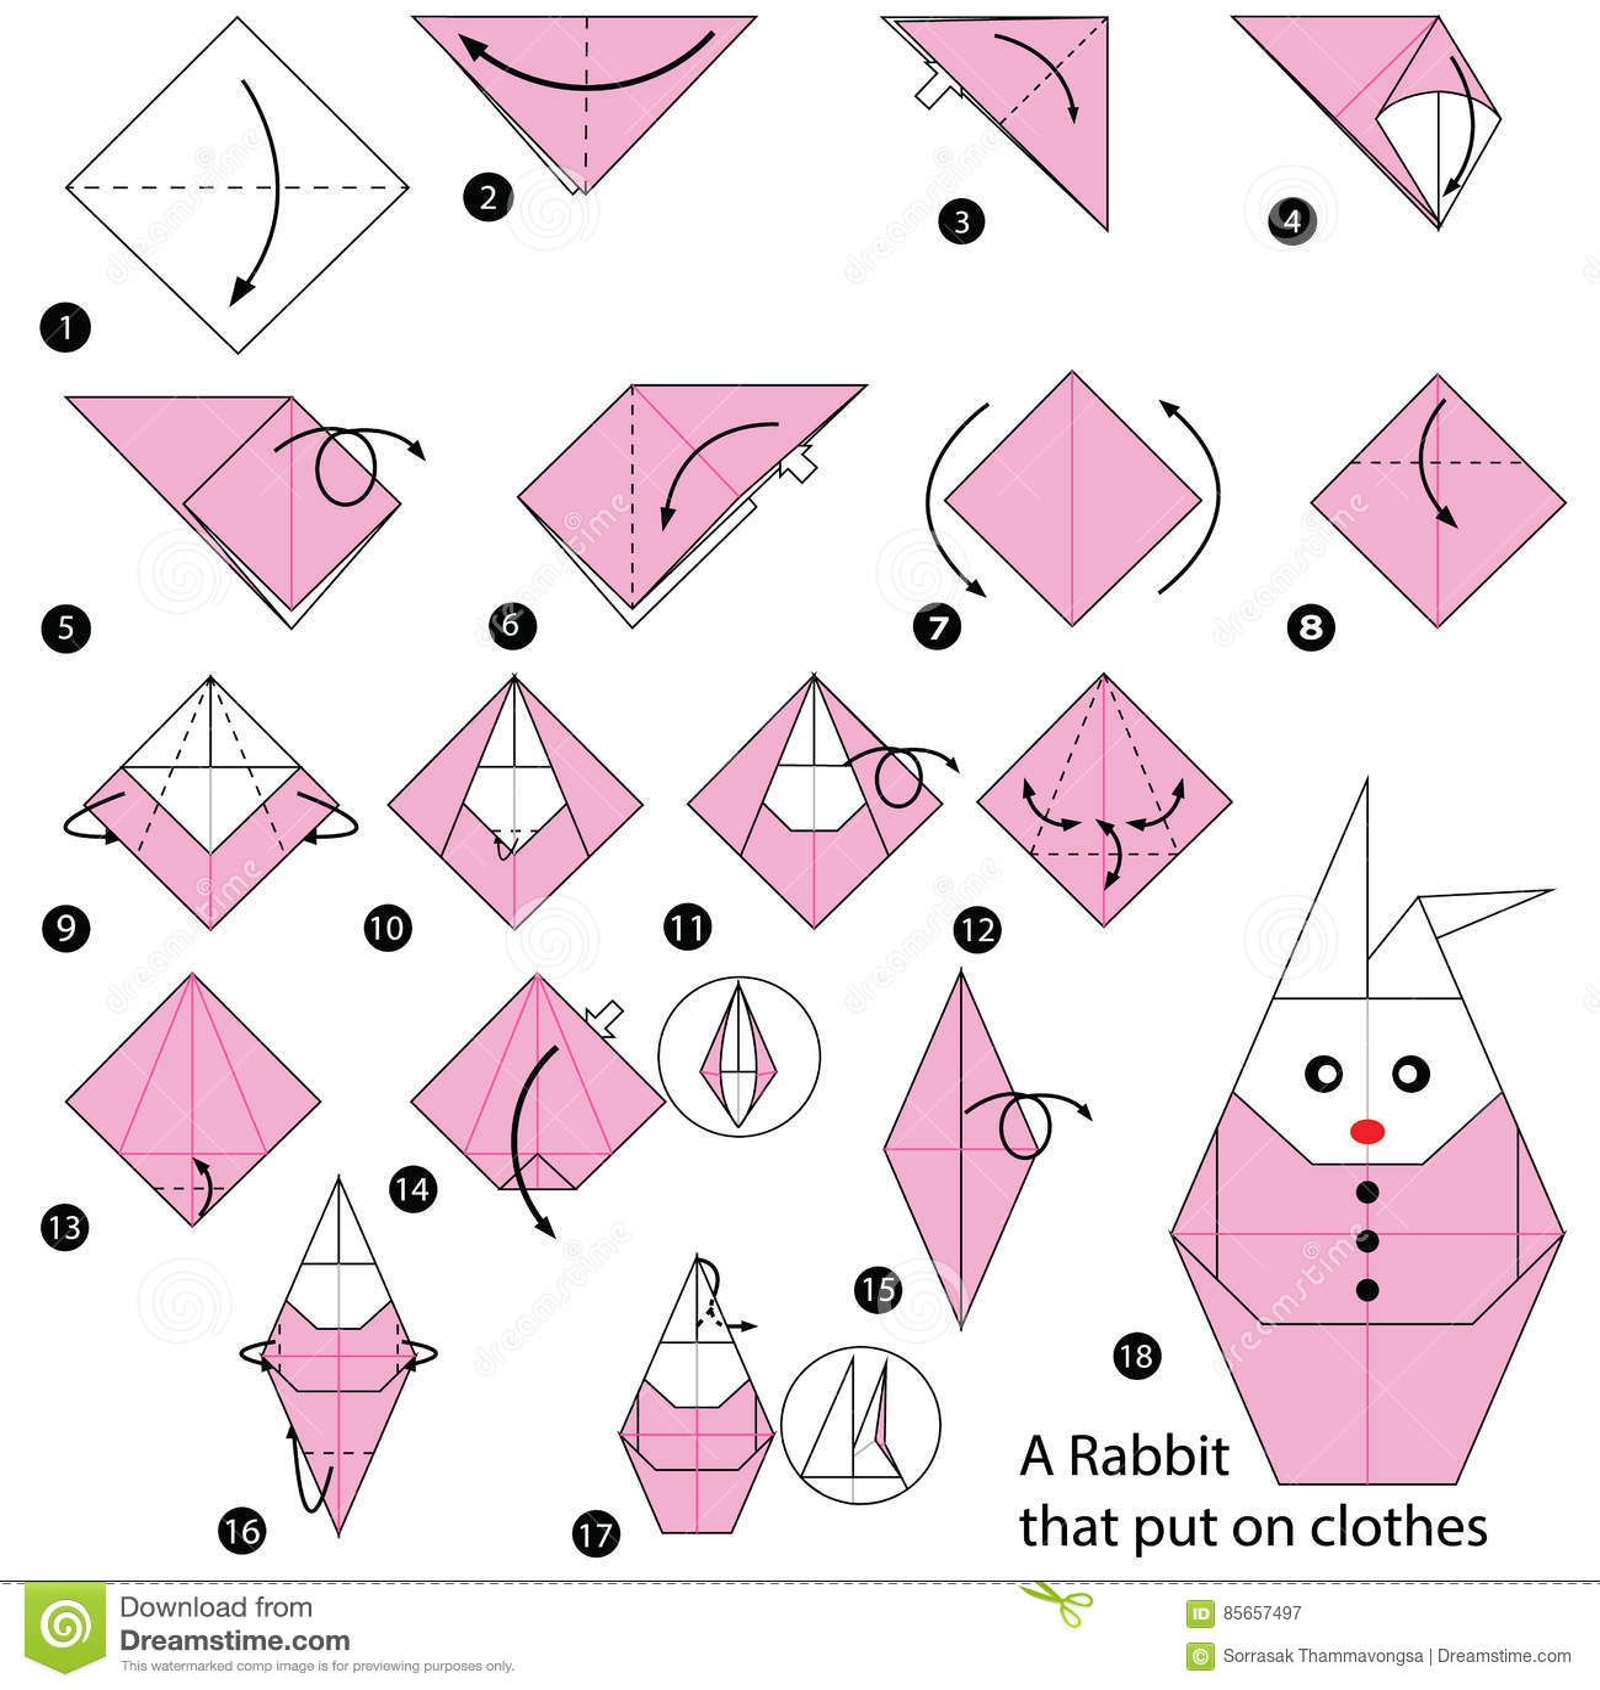 Origami Animal Instructions Rabbit | Tutorial Origami Handmade - photo#34